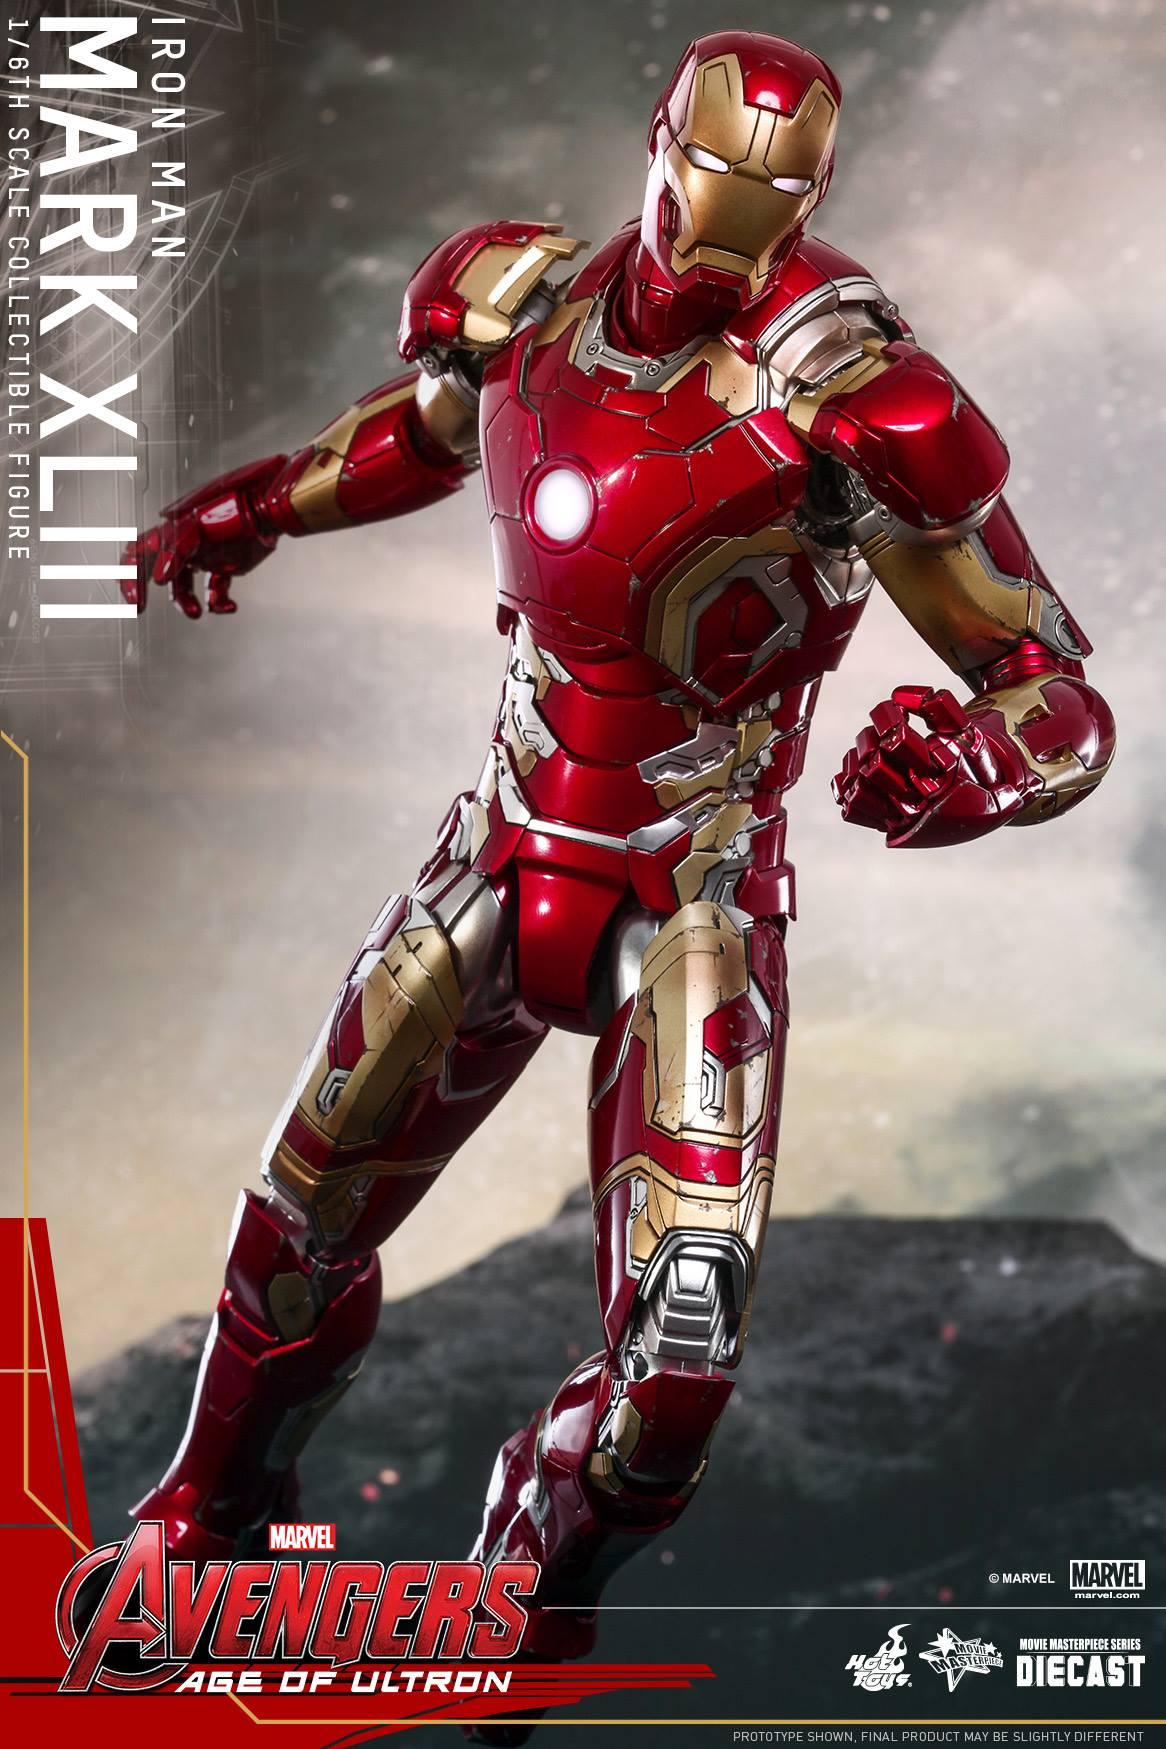 Hot Toys Avengers 2 Age of Ultron - Iron Man Mark XLIII 17 ...